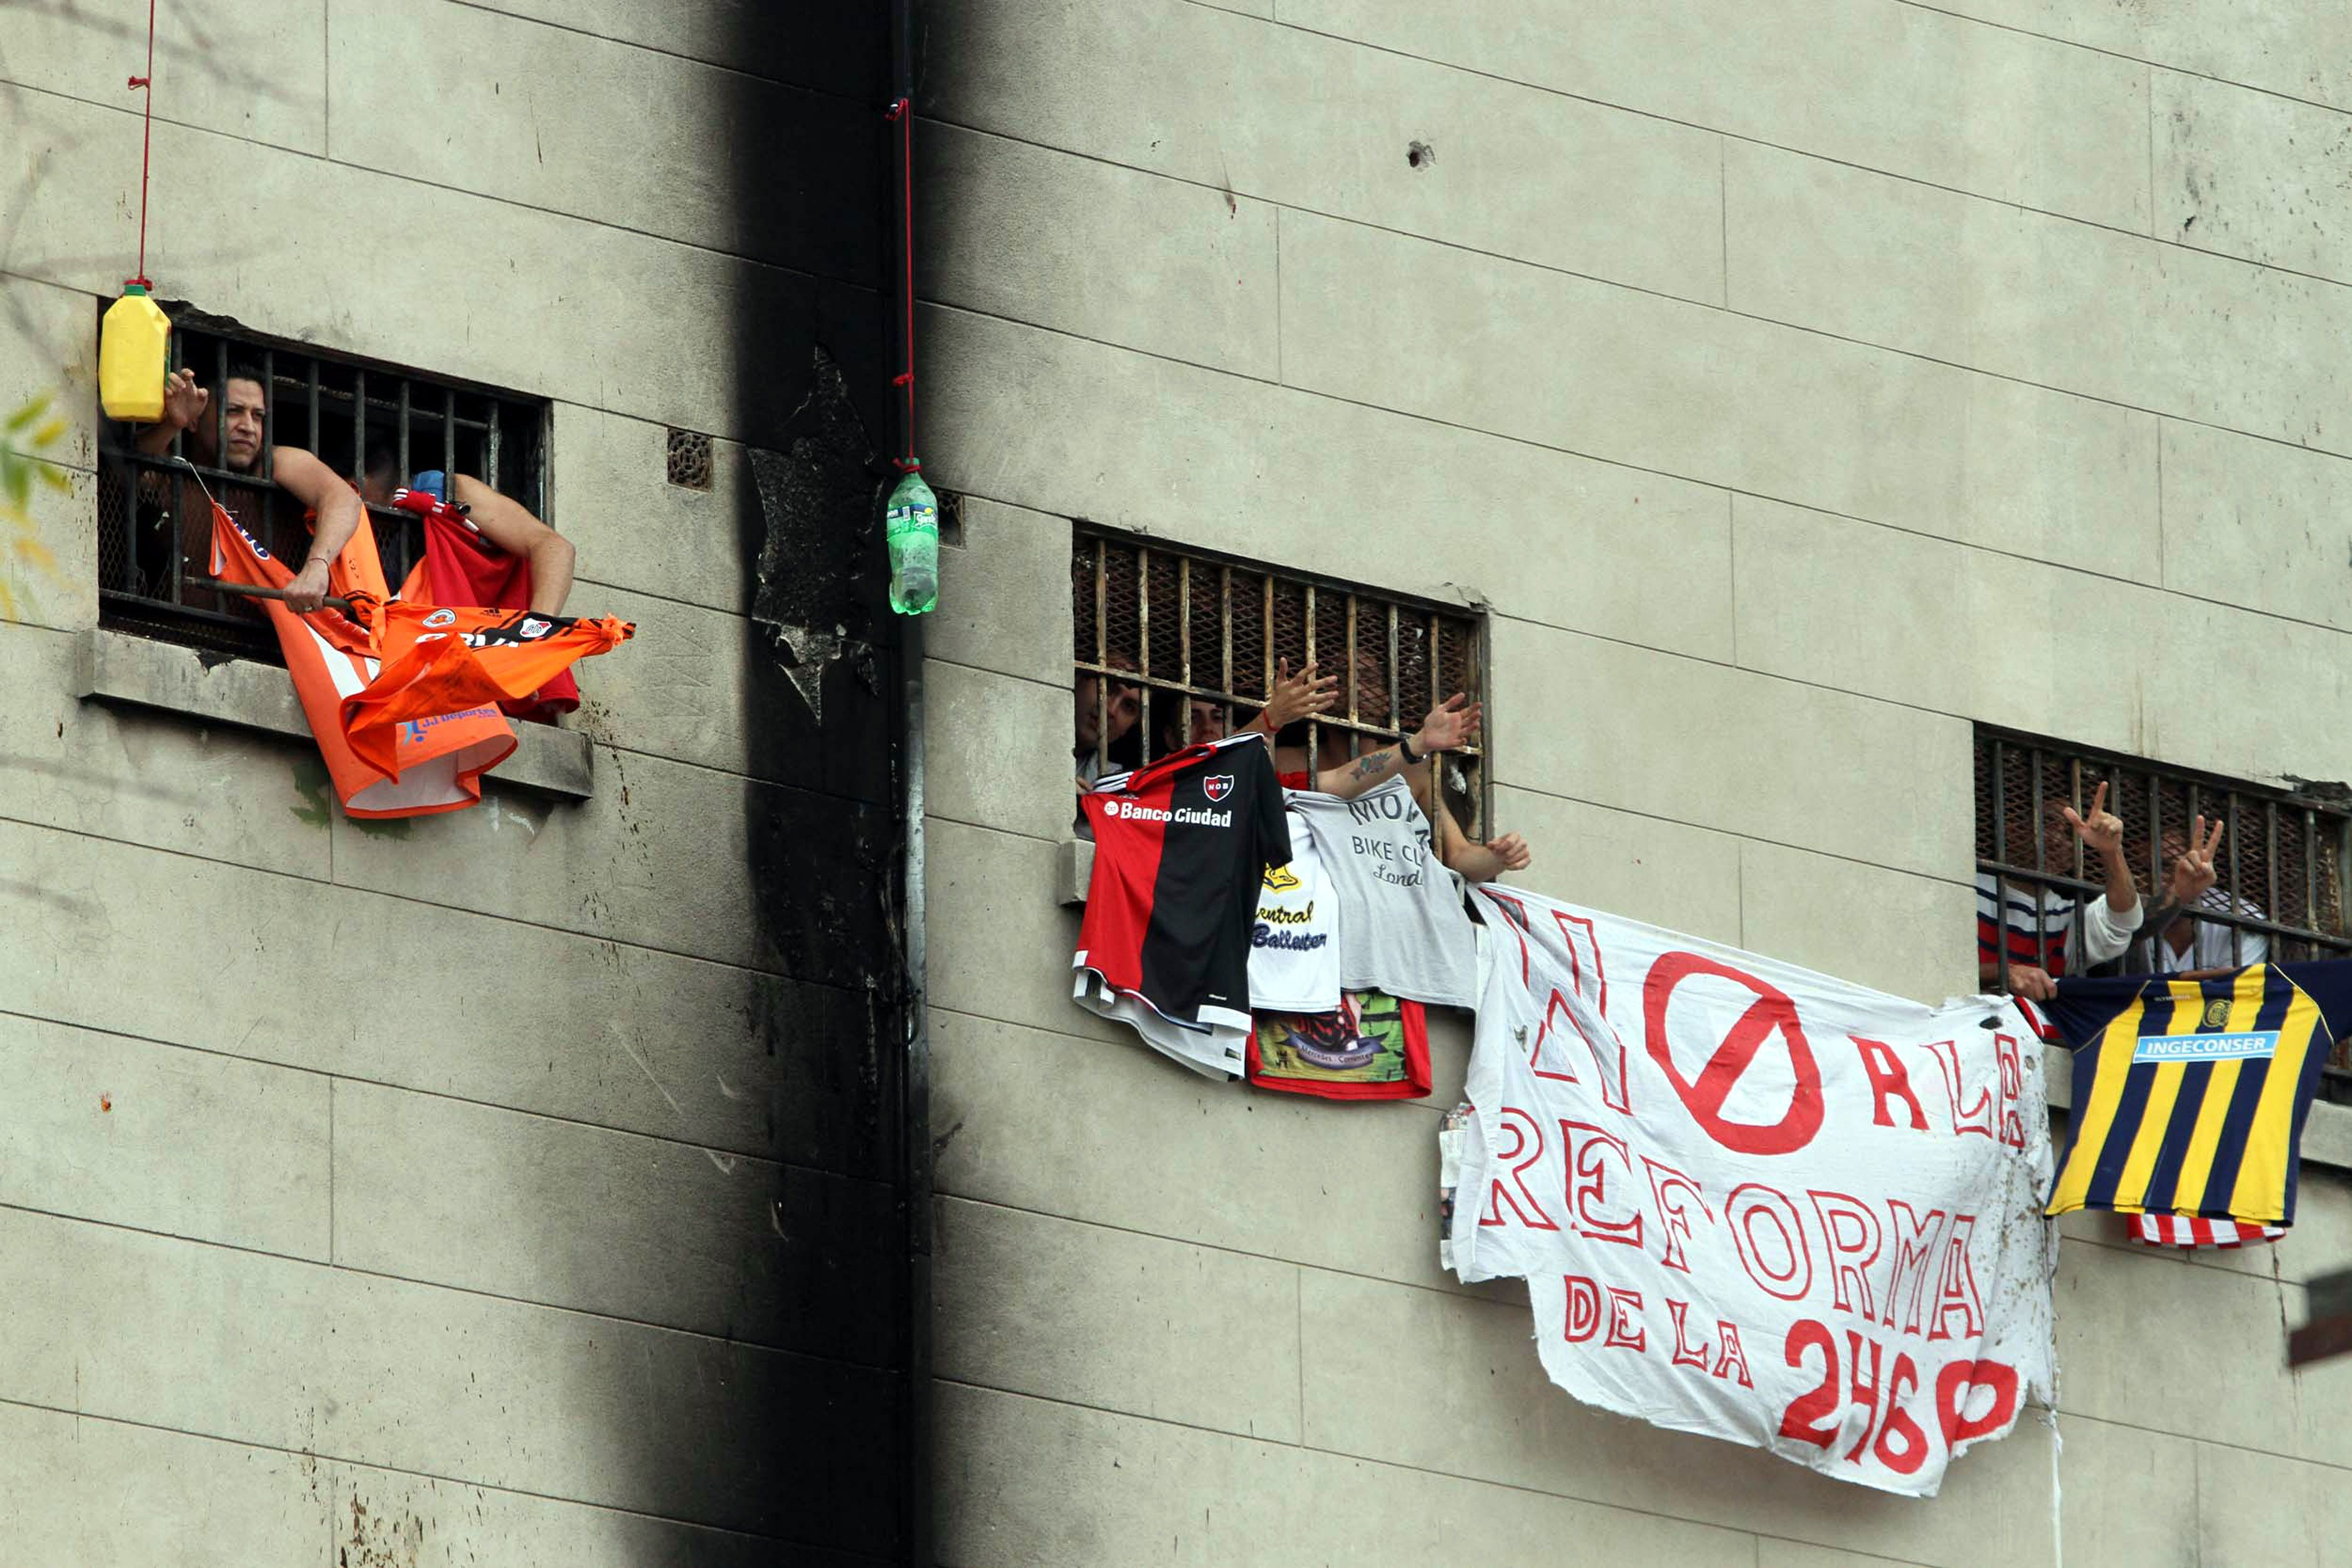 Cárcel de Devoto: presos iniciaron una huelga de hambre